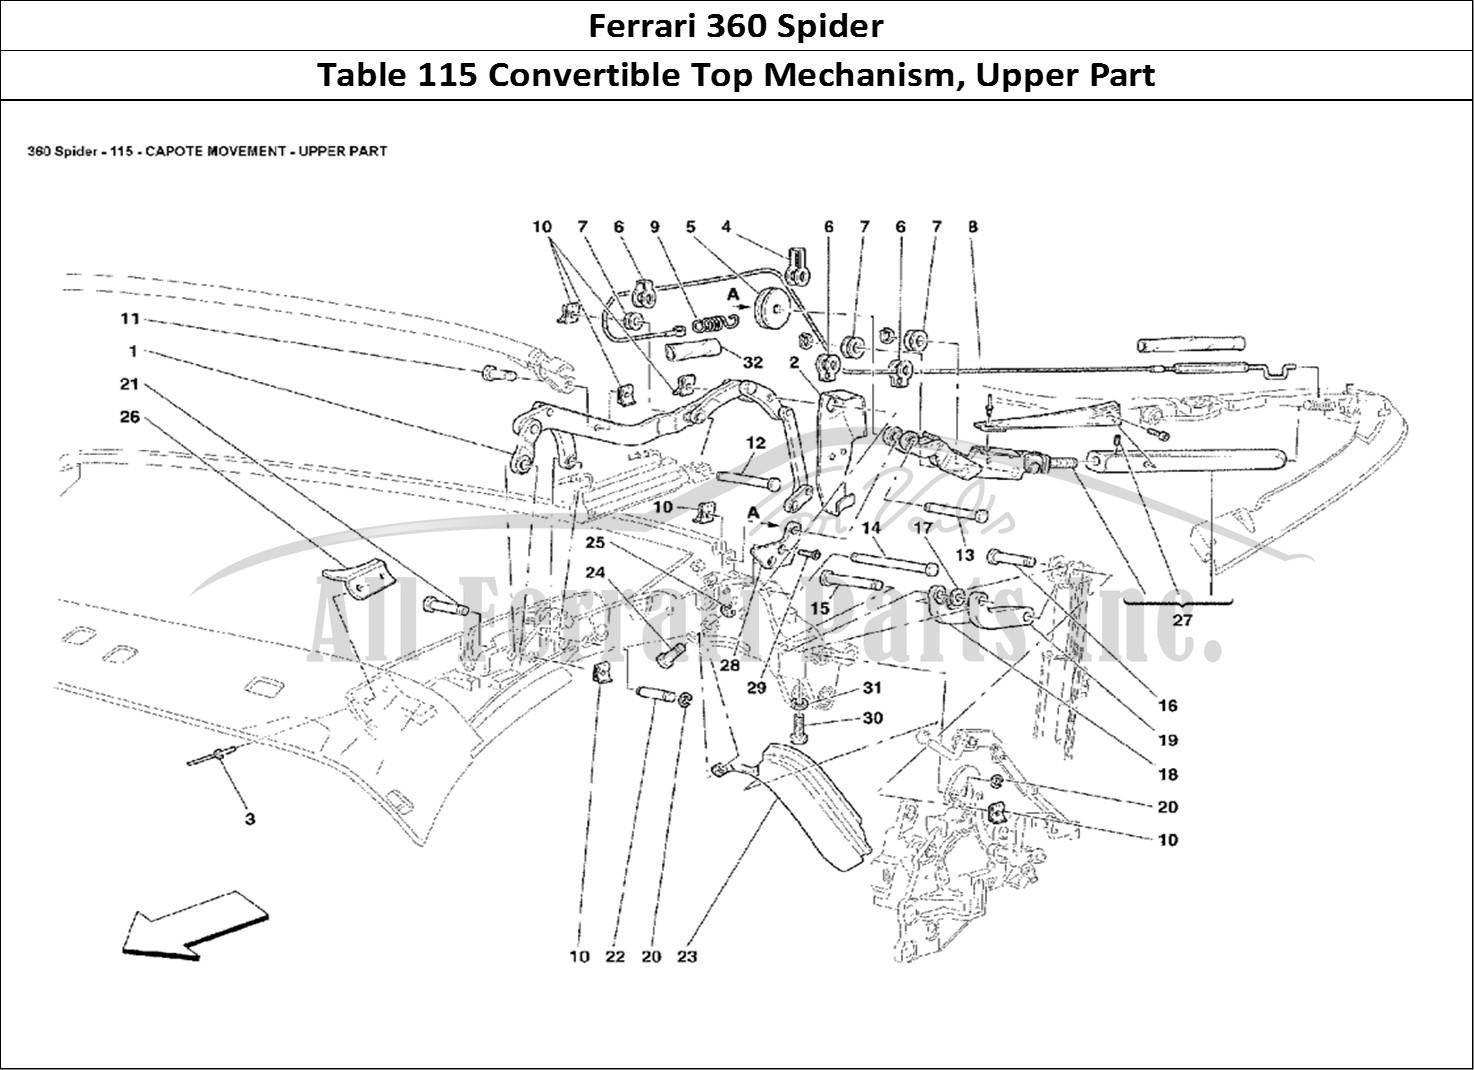 Buy Original Ferrari 360 Spider 115 Convertible Top